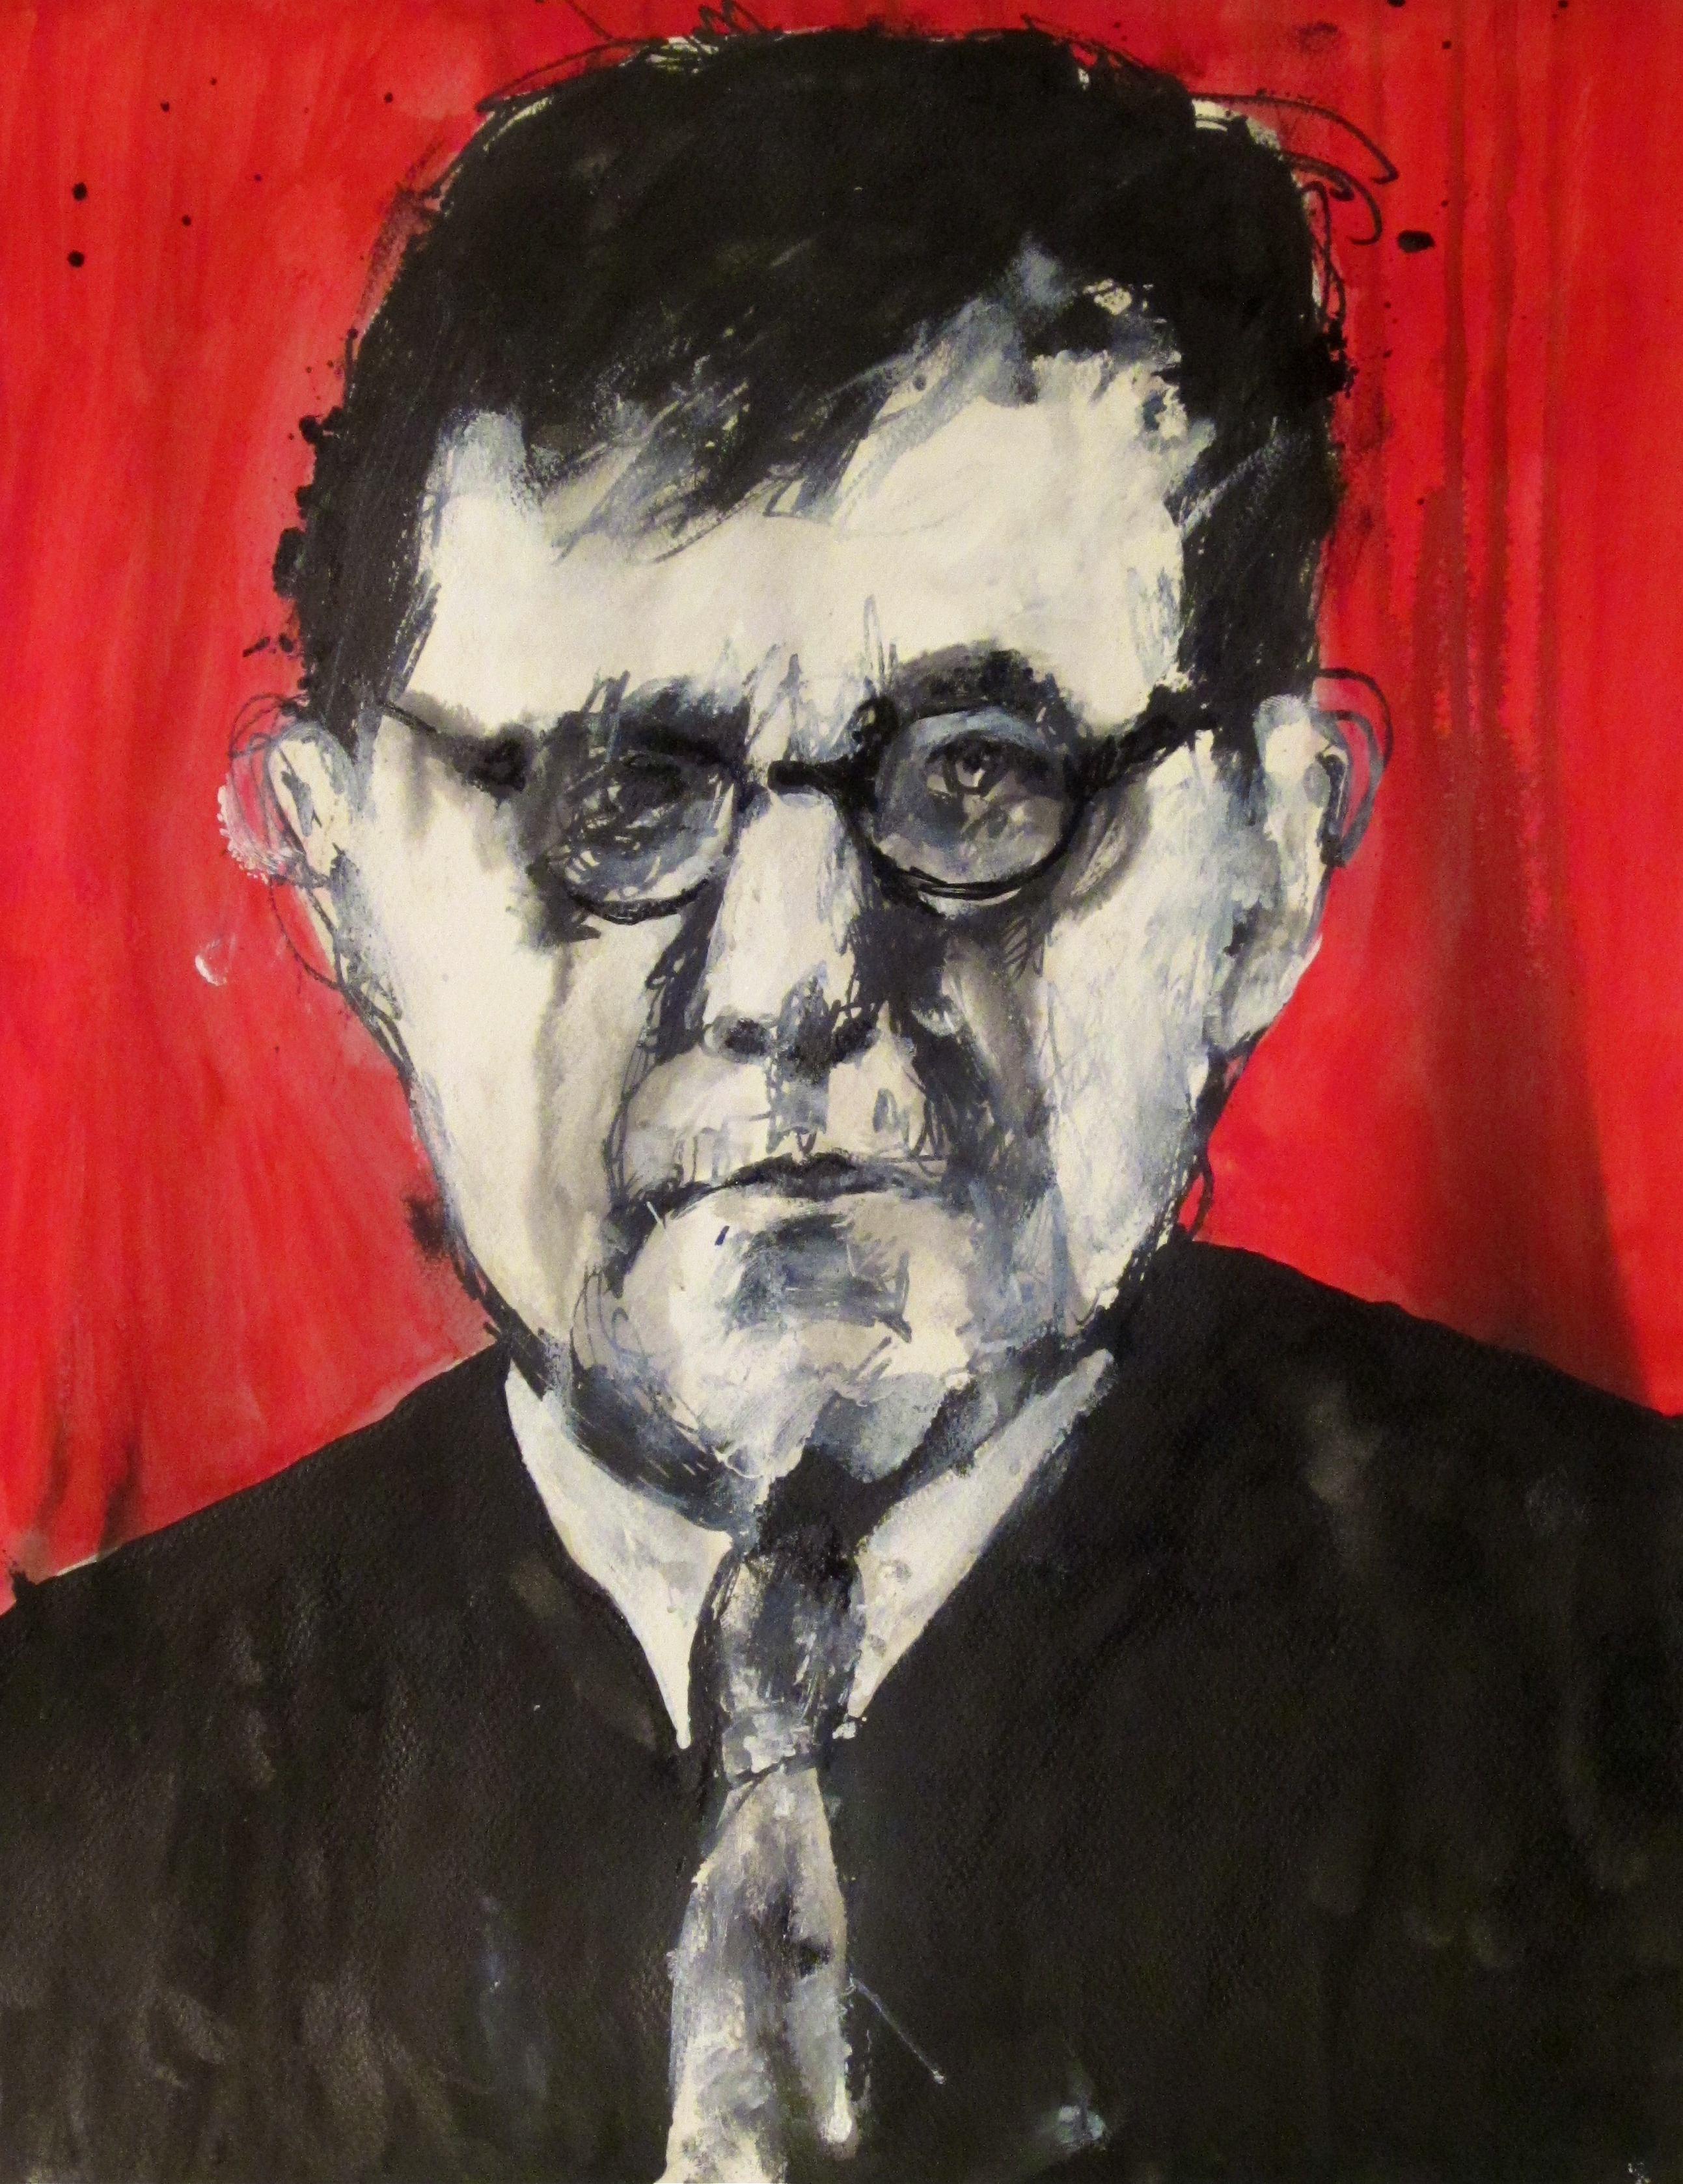 Shostakovich. Ink + acrylic on paper. 2011